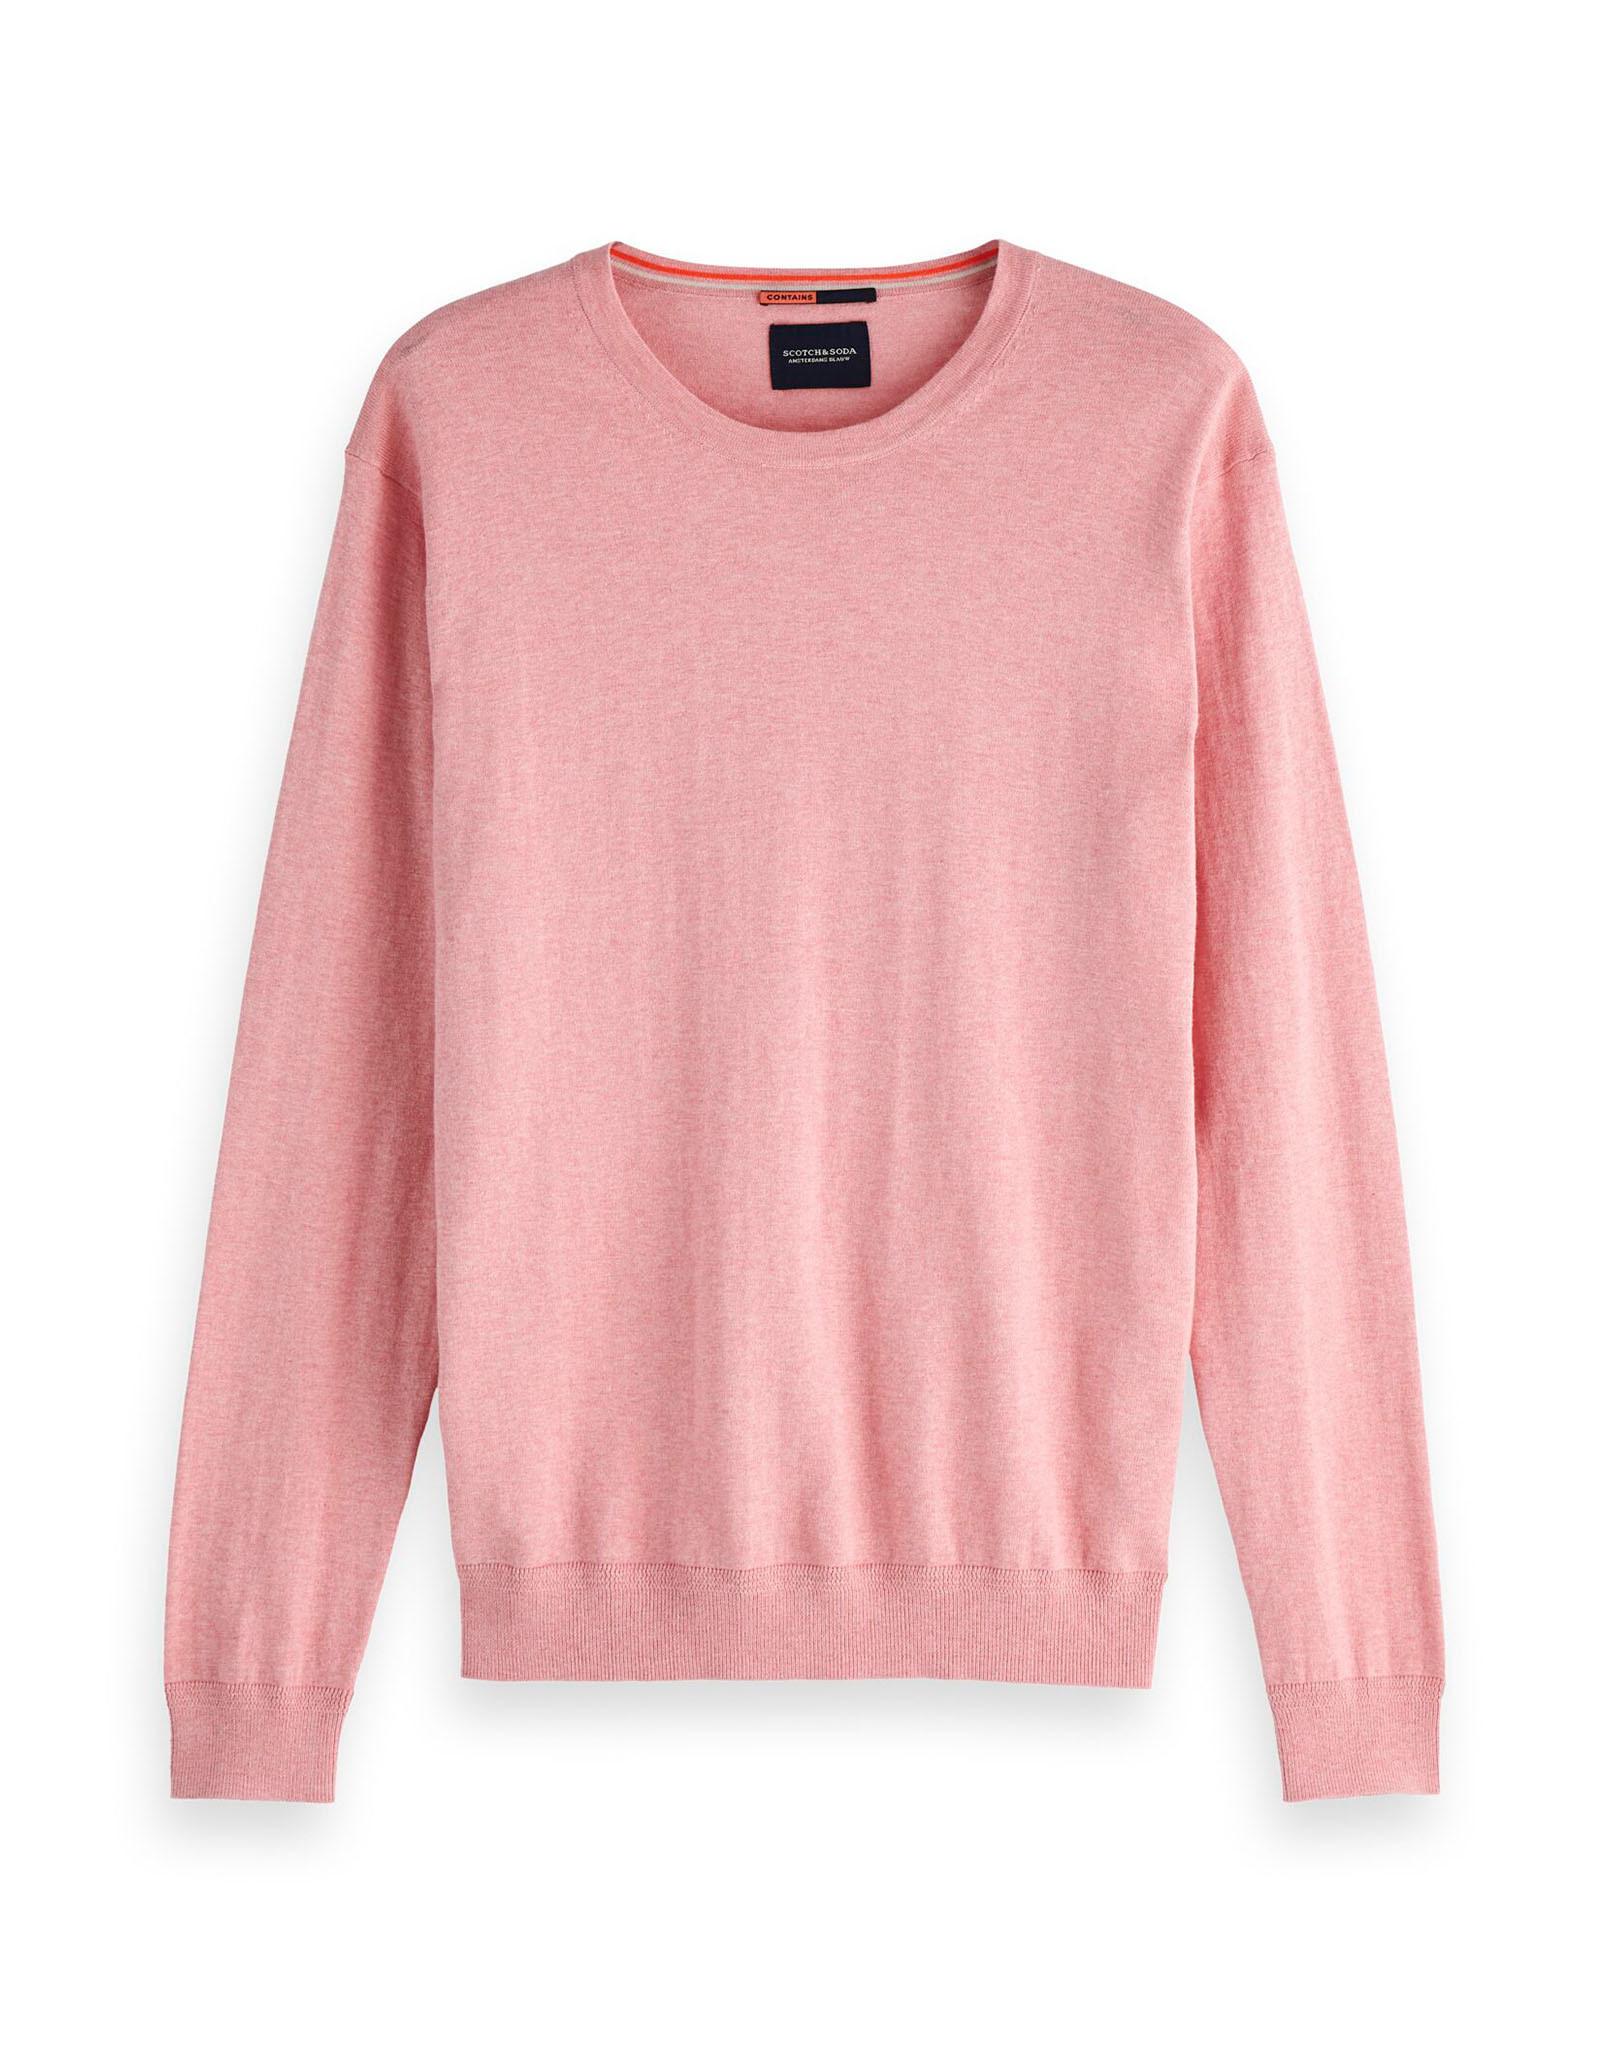 Scotch & Soda Cotton Cashmere Knit | Pink Floss